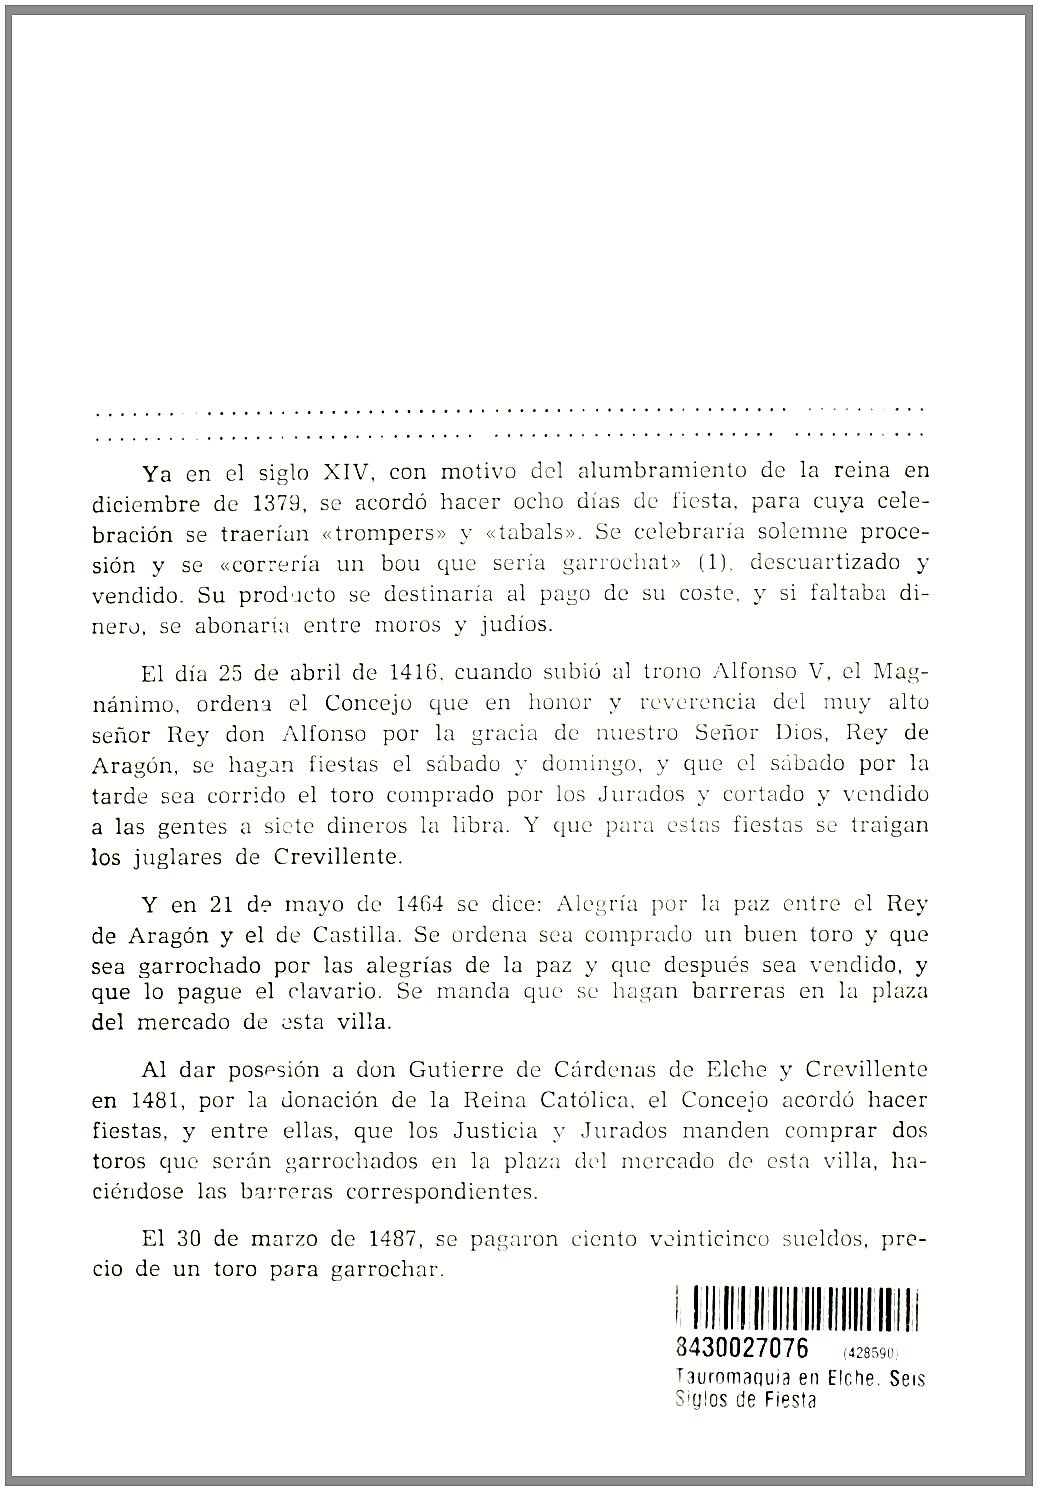 SEIS SIGLOS DE LA FIESTA DE TOROS.: Alejandro. RAMOS FOLQUES: 9788430027071: Amazon.com: Books